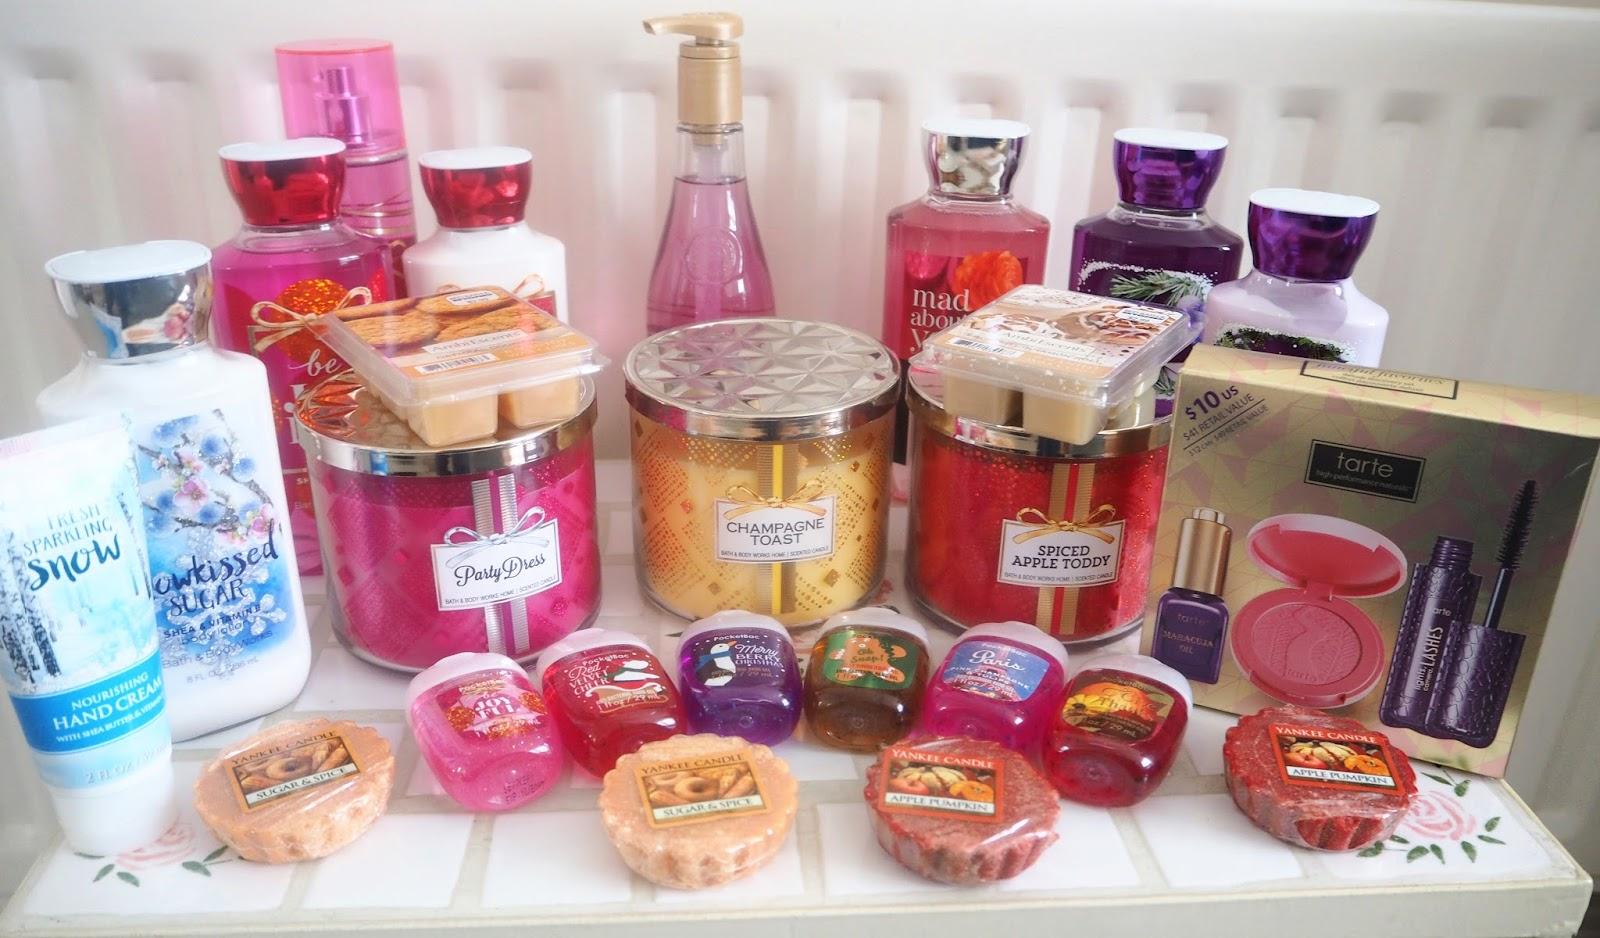 New York Haul: Bath & Bodyworks, Yankee Candle, Tarte Cosmetics | Katie Kirk Loves